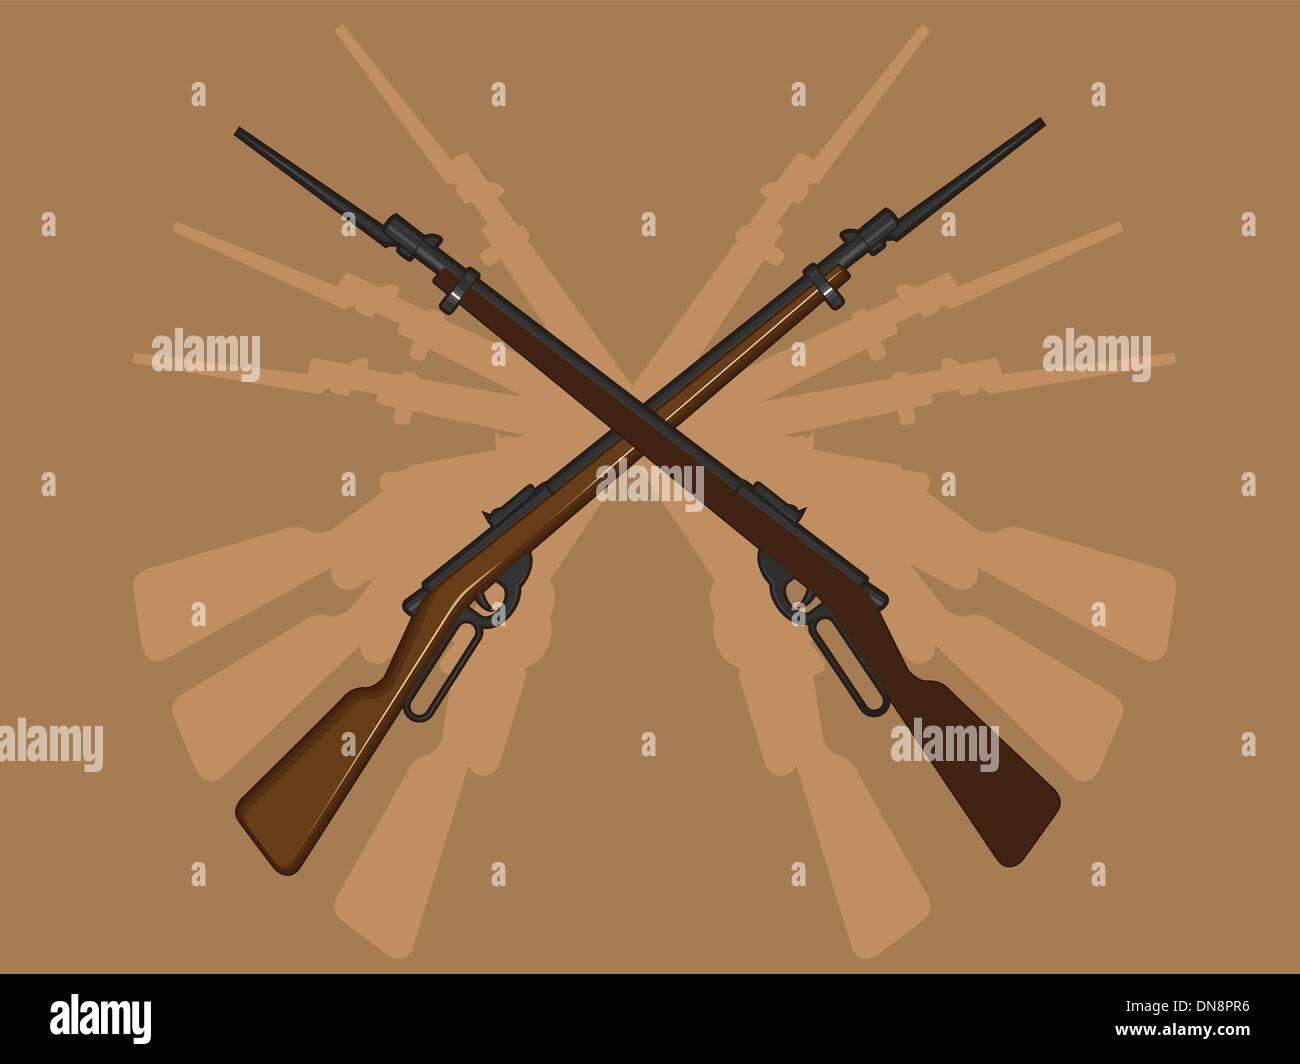 World War II Rifle with Bayonet - Stock Vector